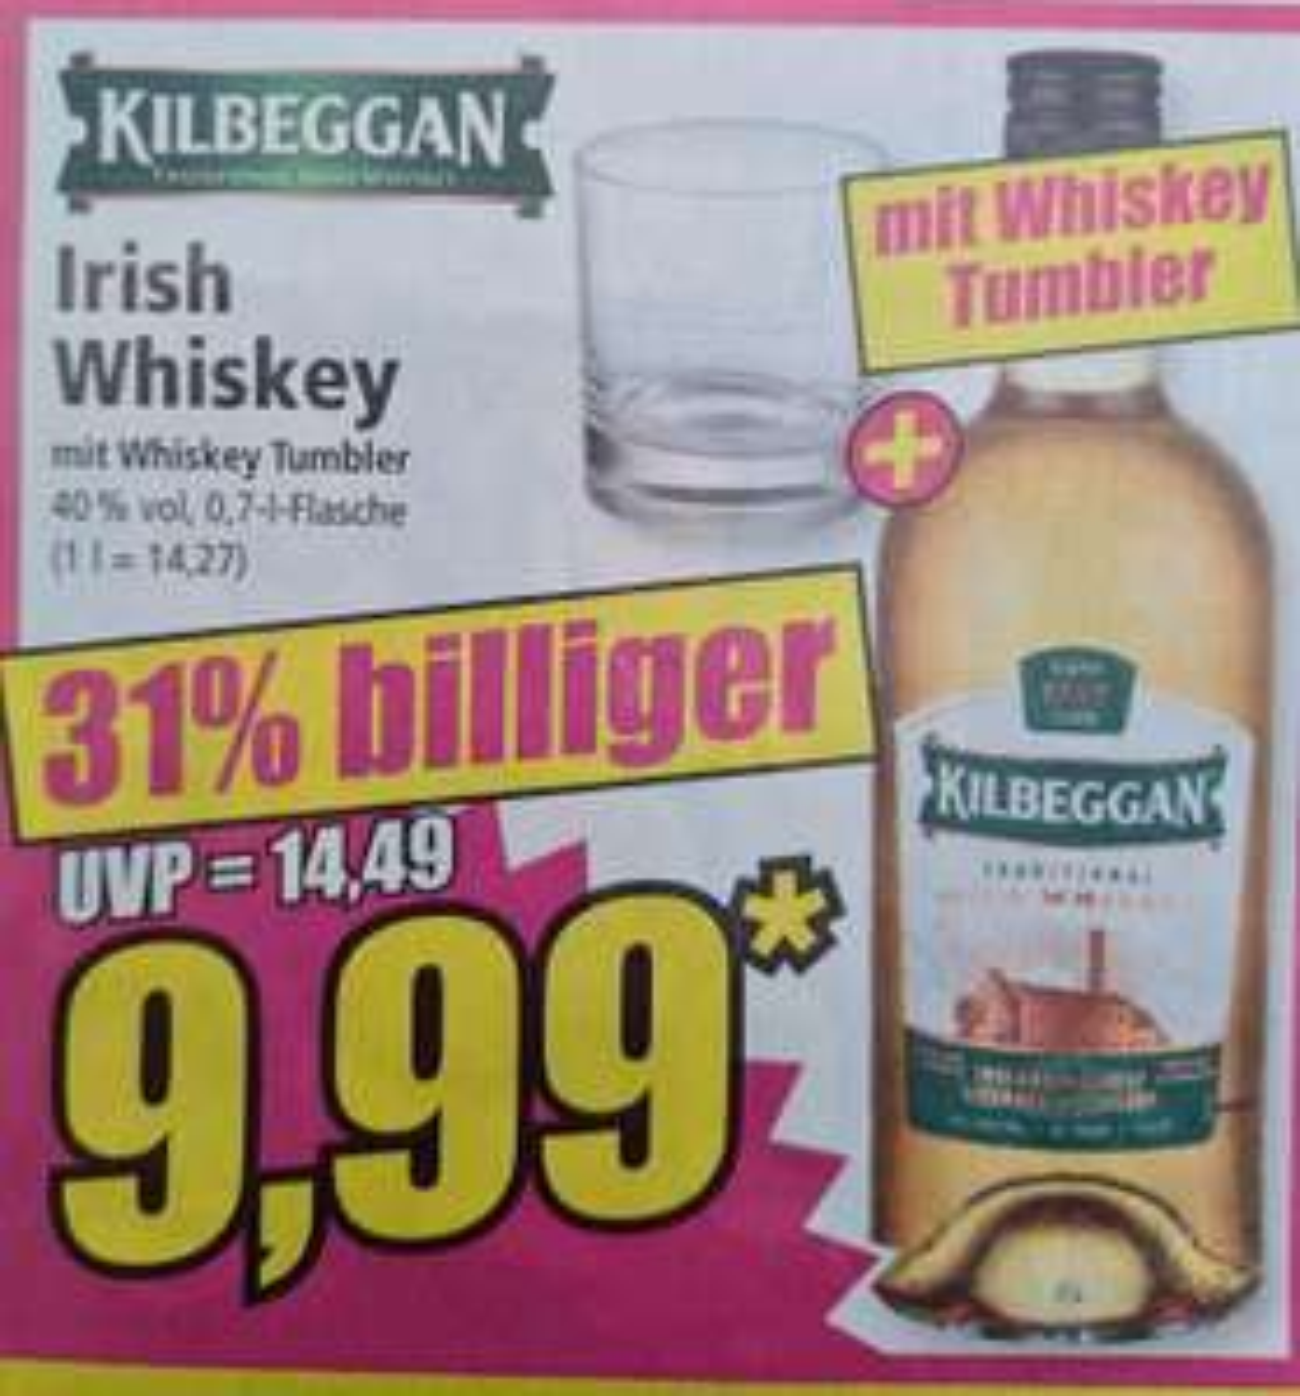 Kilbeggan Irish Whiskey mit Whiskey Tumbler 40% 0,7 l eventuell Lokal RPL ab 09.07 Norma